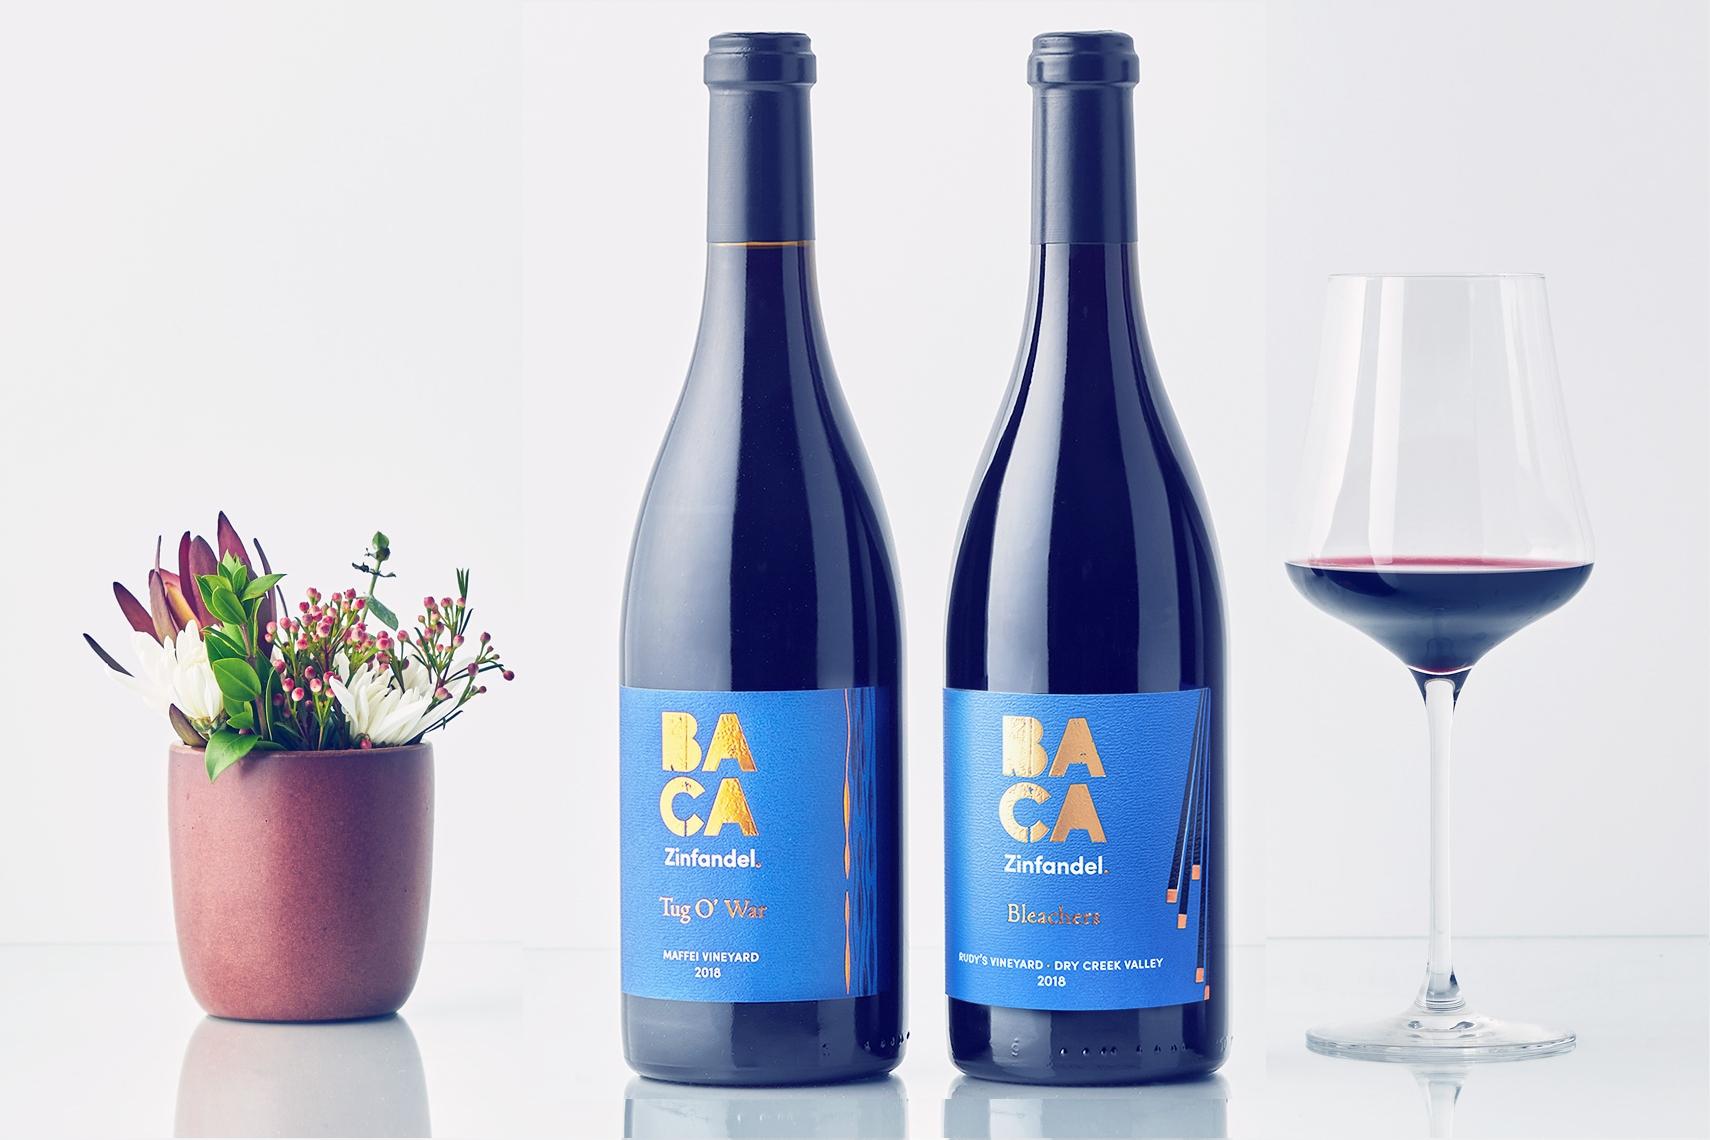 BACA Members 3Rd Quarter 2020 Club Shipment image of two bottles of BACA Zinfandel